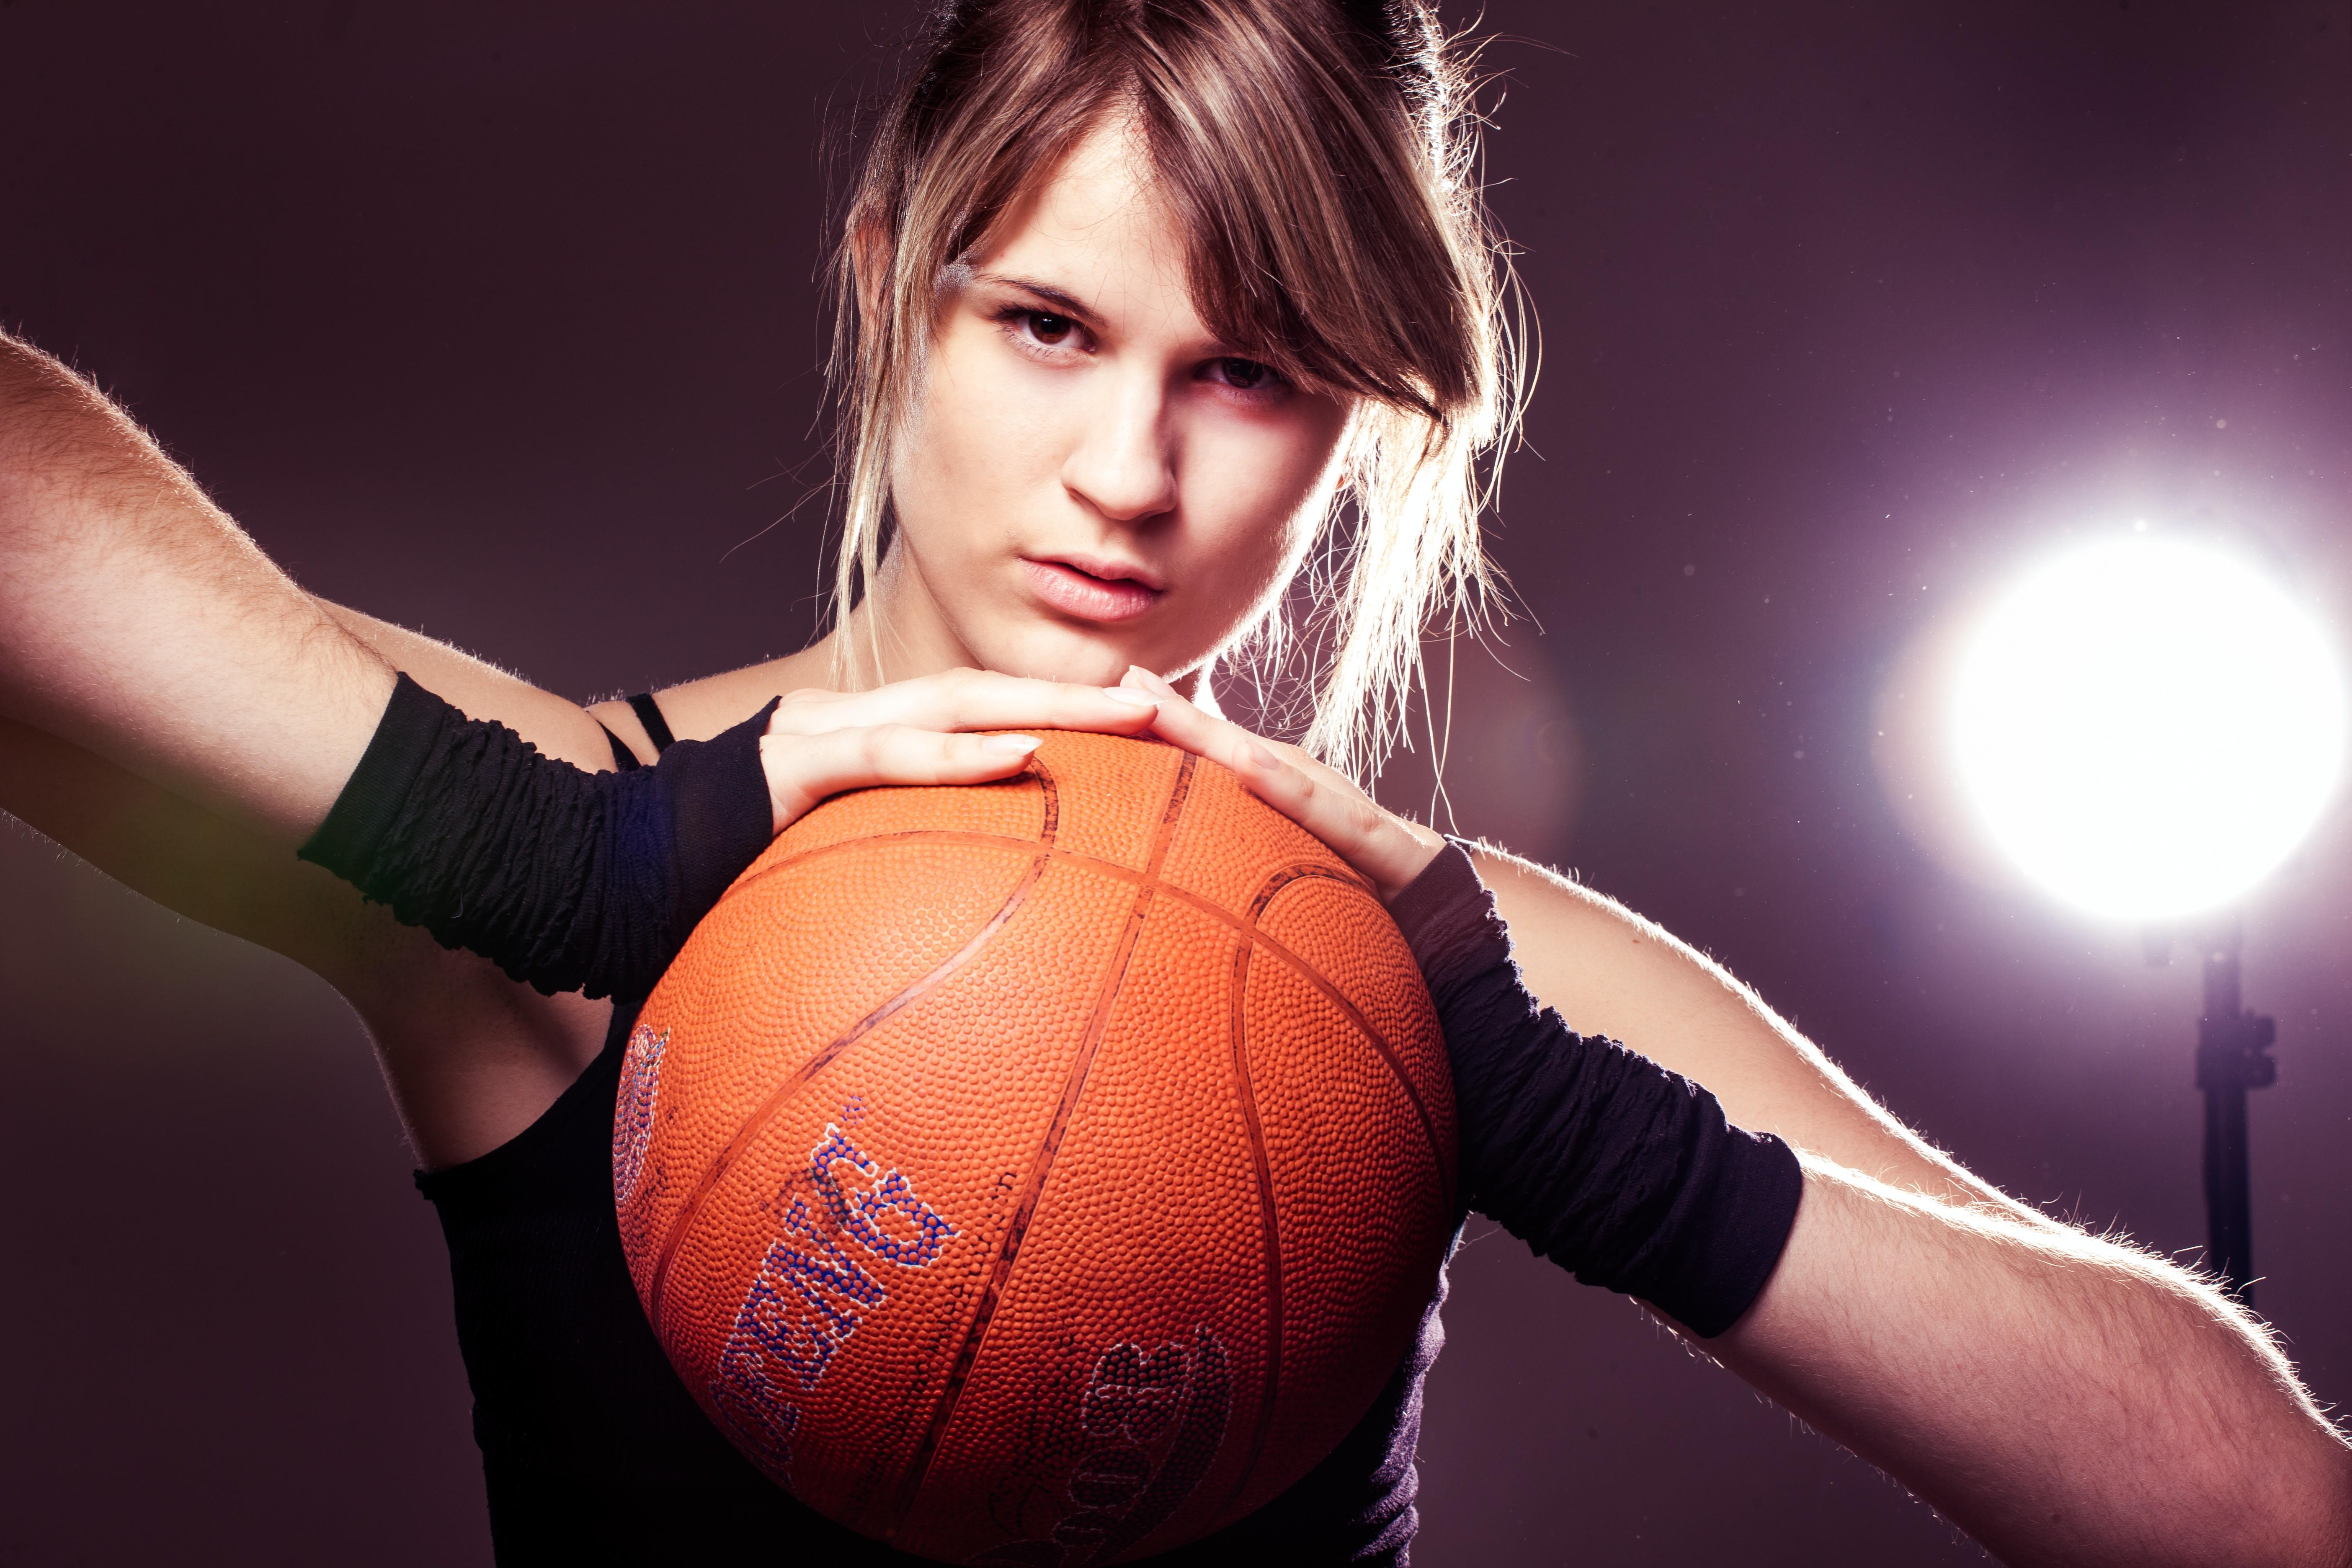 L'évolution du basket-ball féminin ?